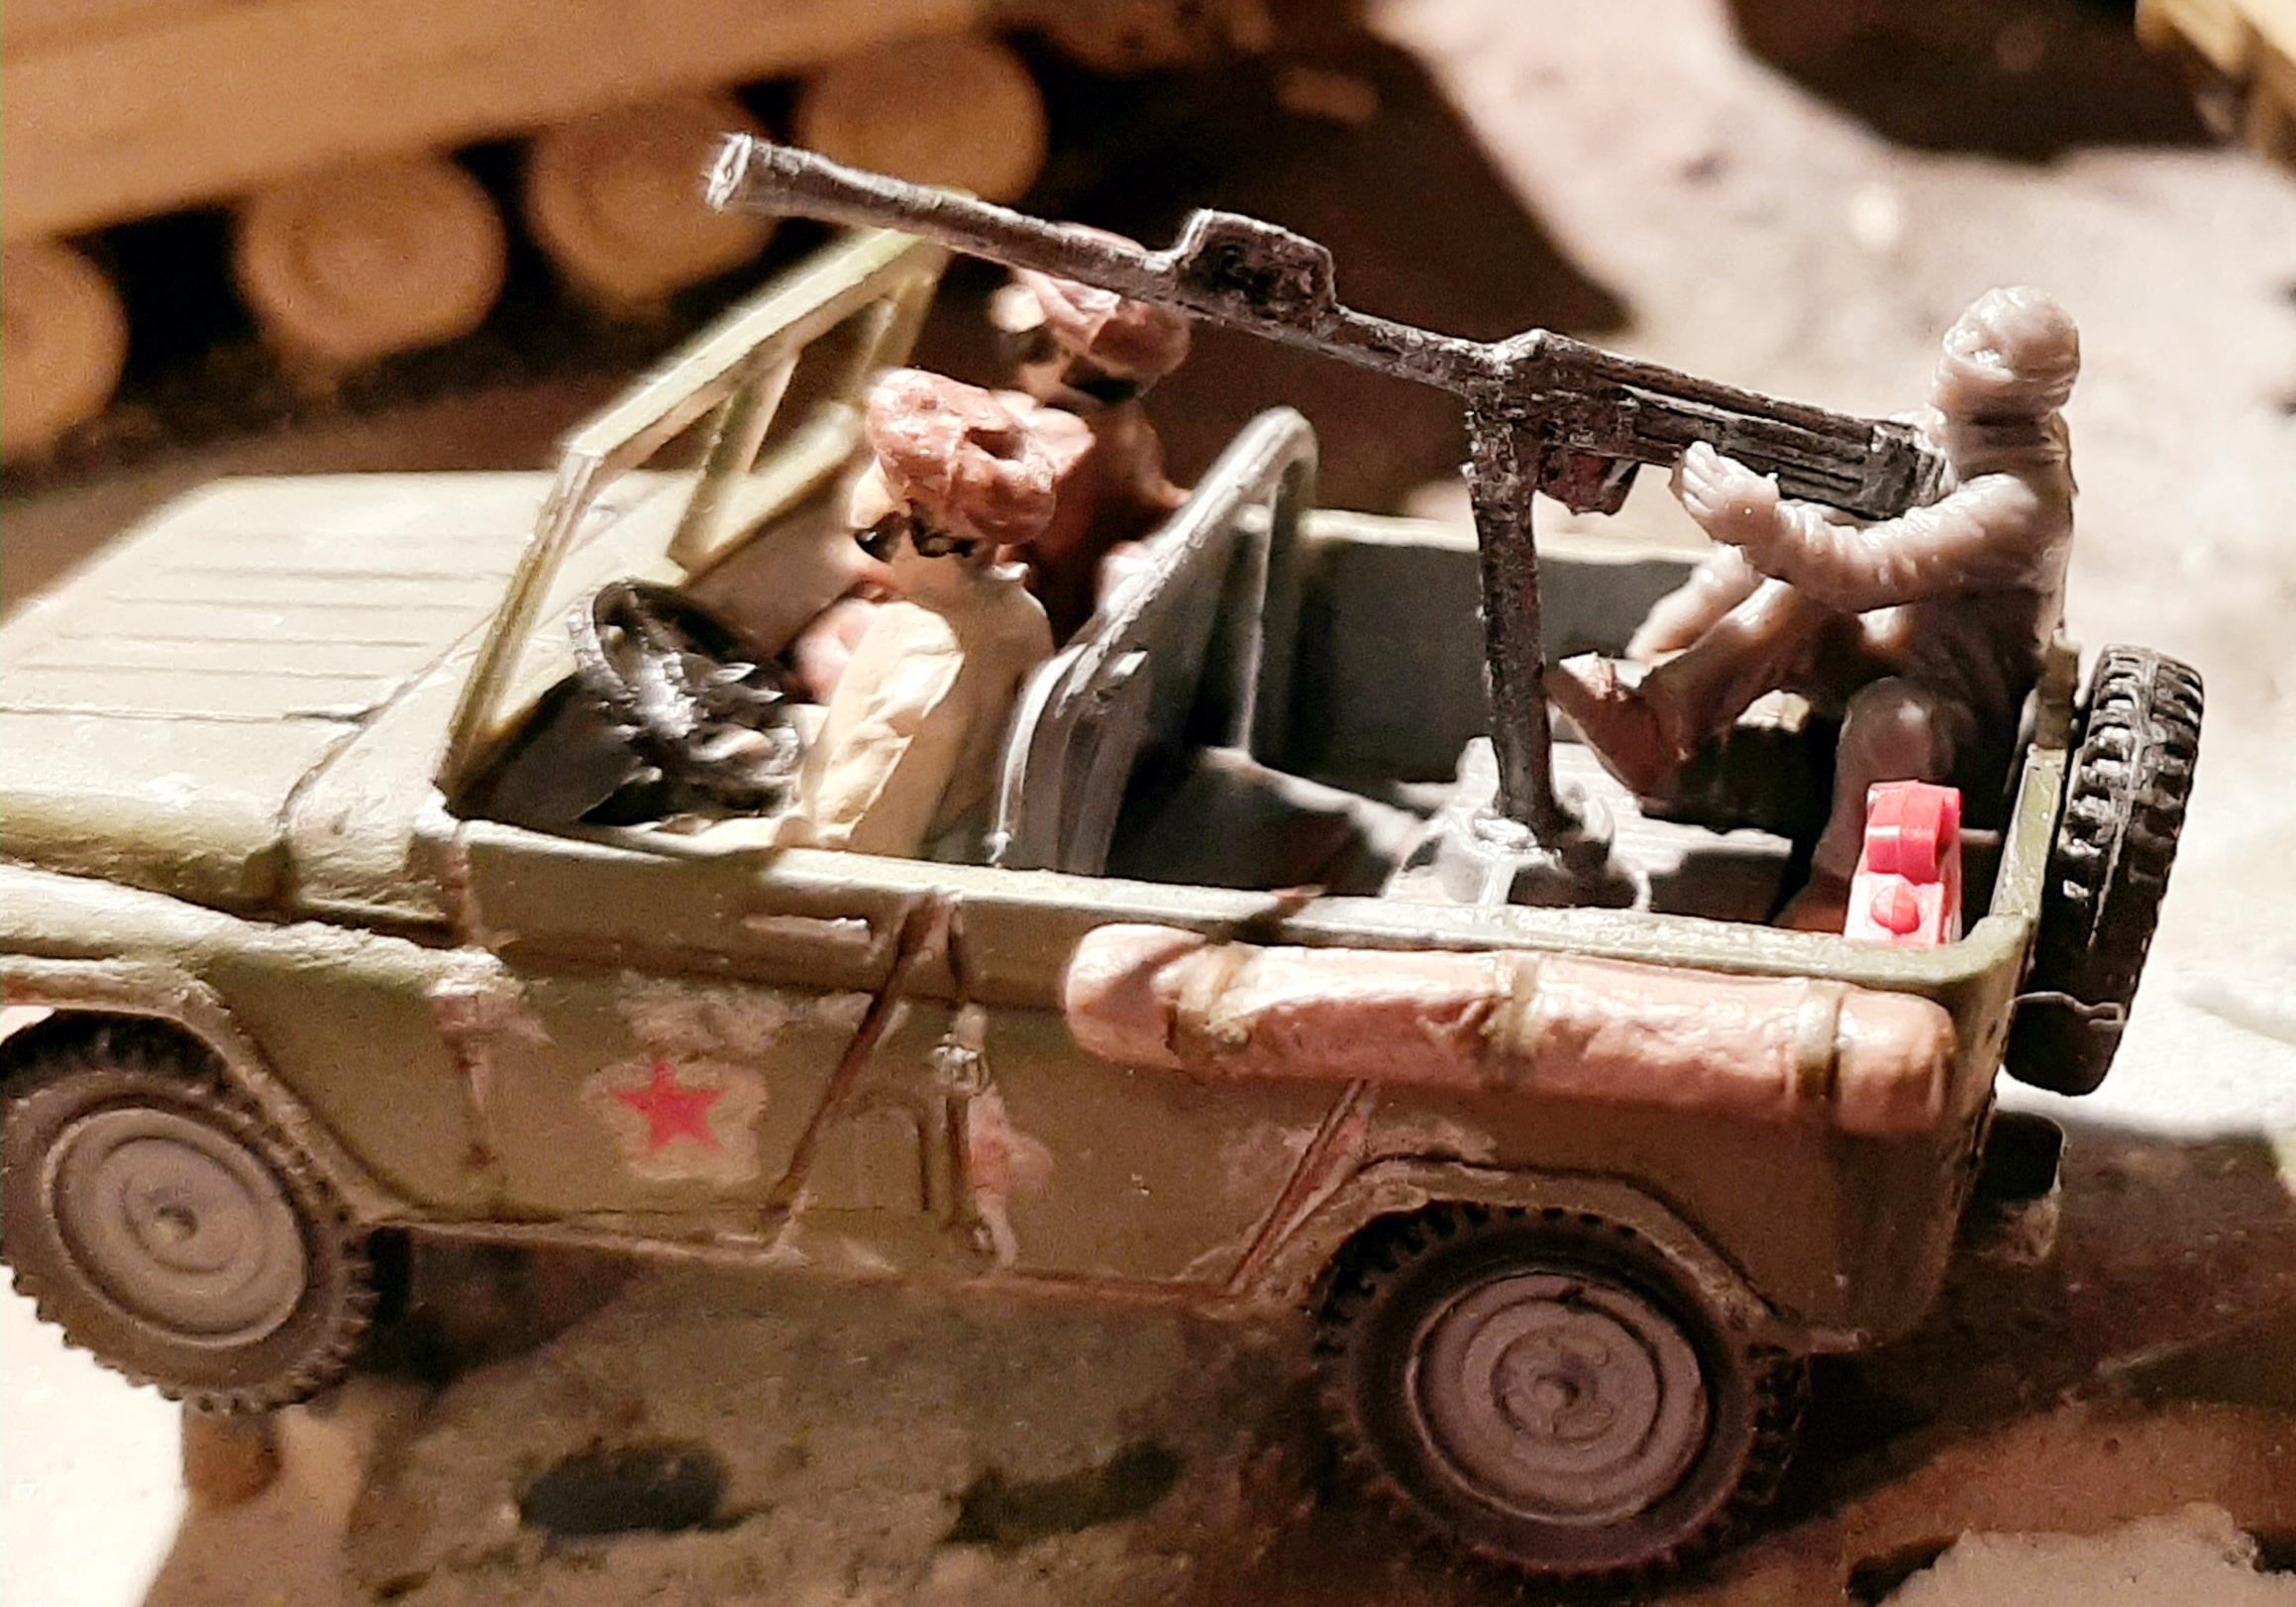 Diorama/Wargame Afghanistan 1/72 32S4k1t